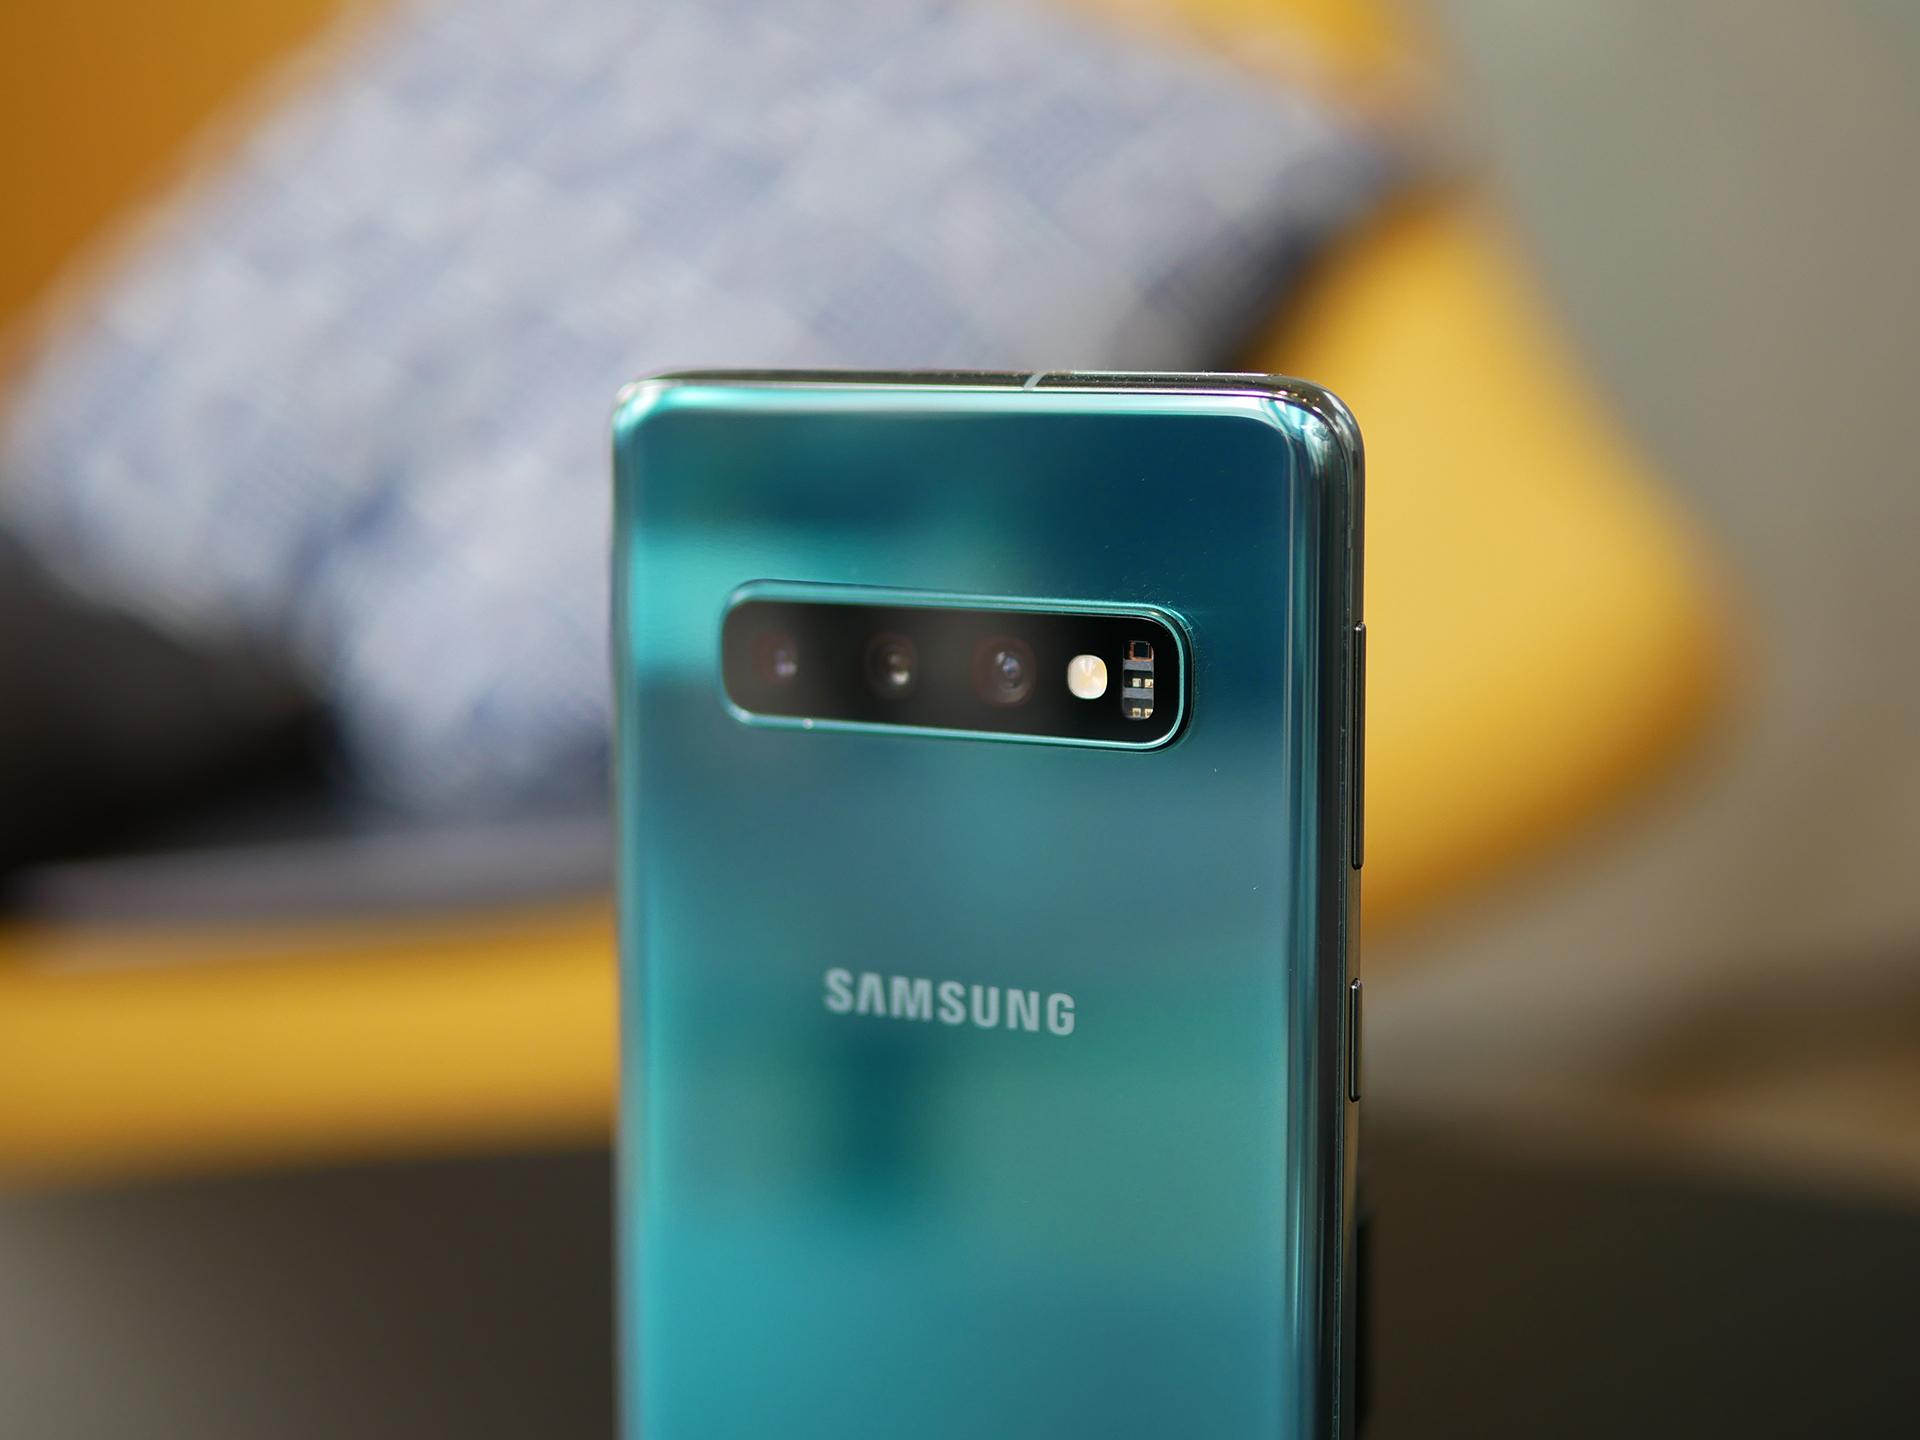 C'è una data di lancio per Samsung Galaxy S10 Lite, Galaxy N